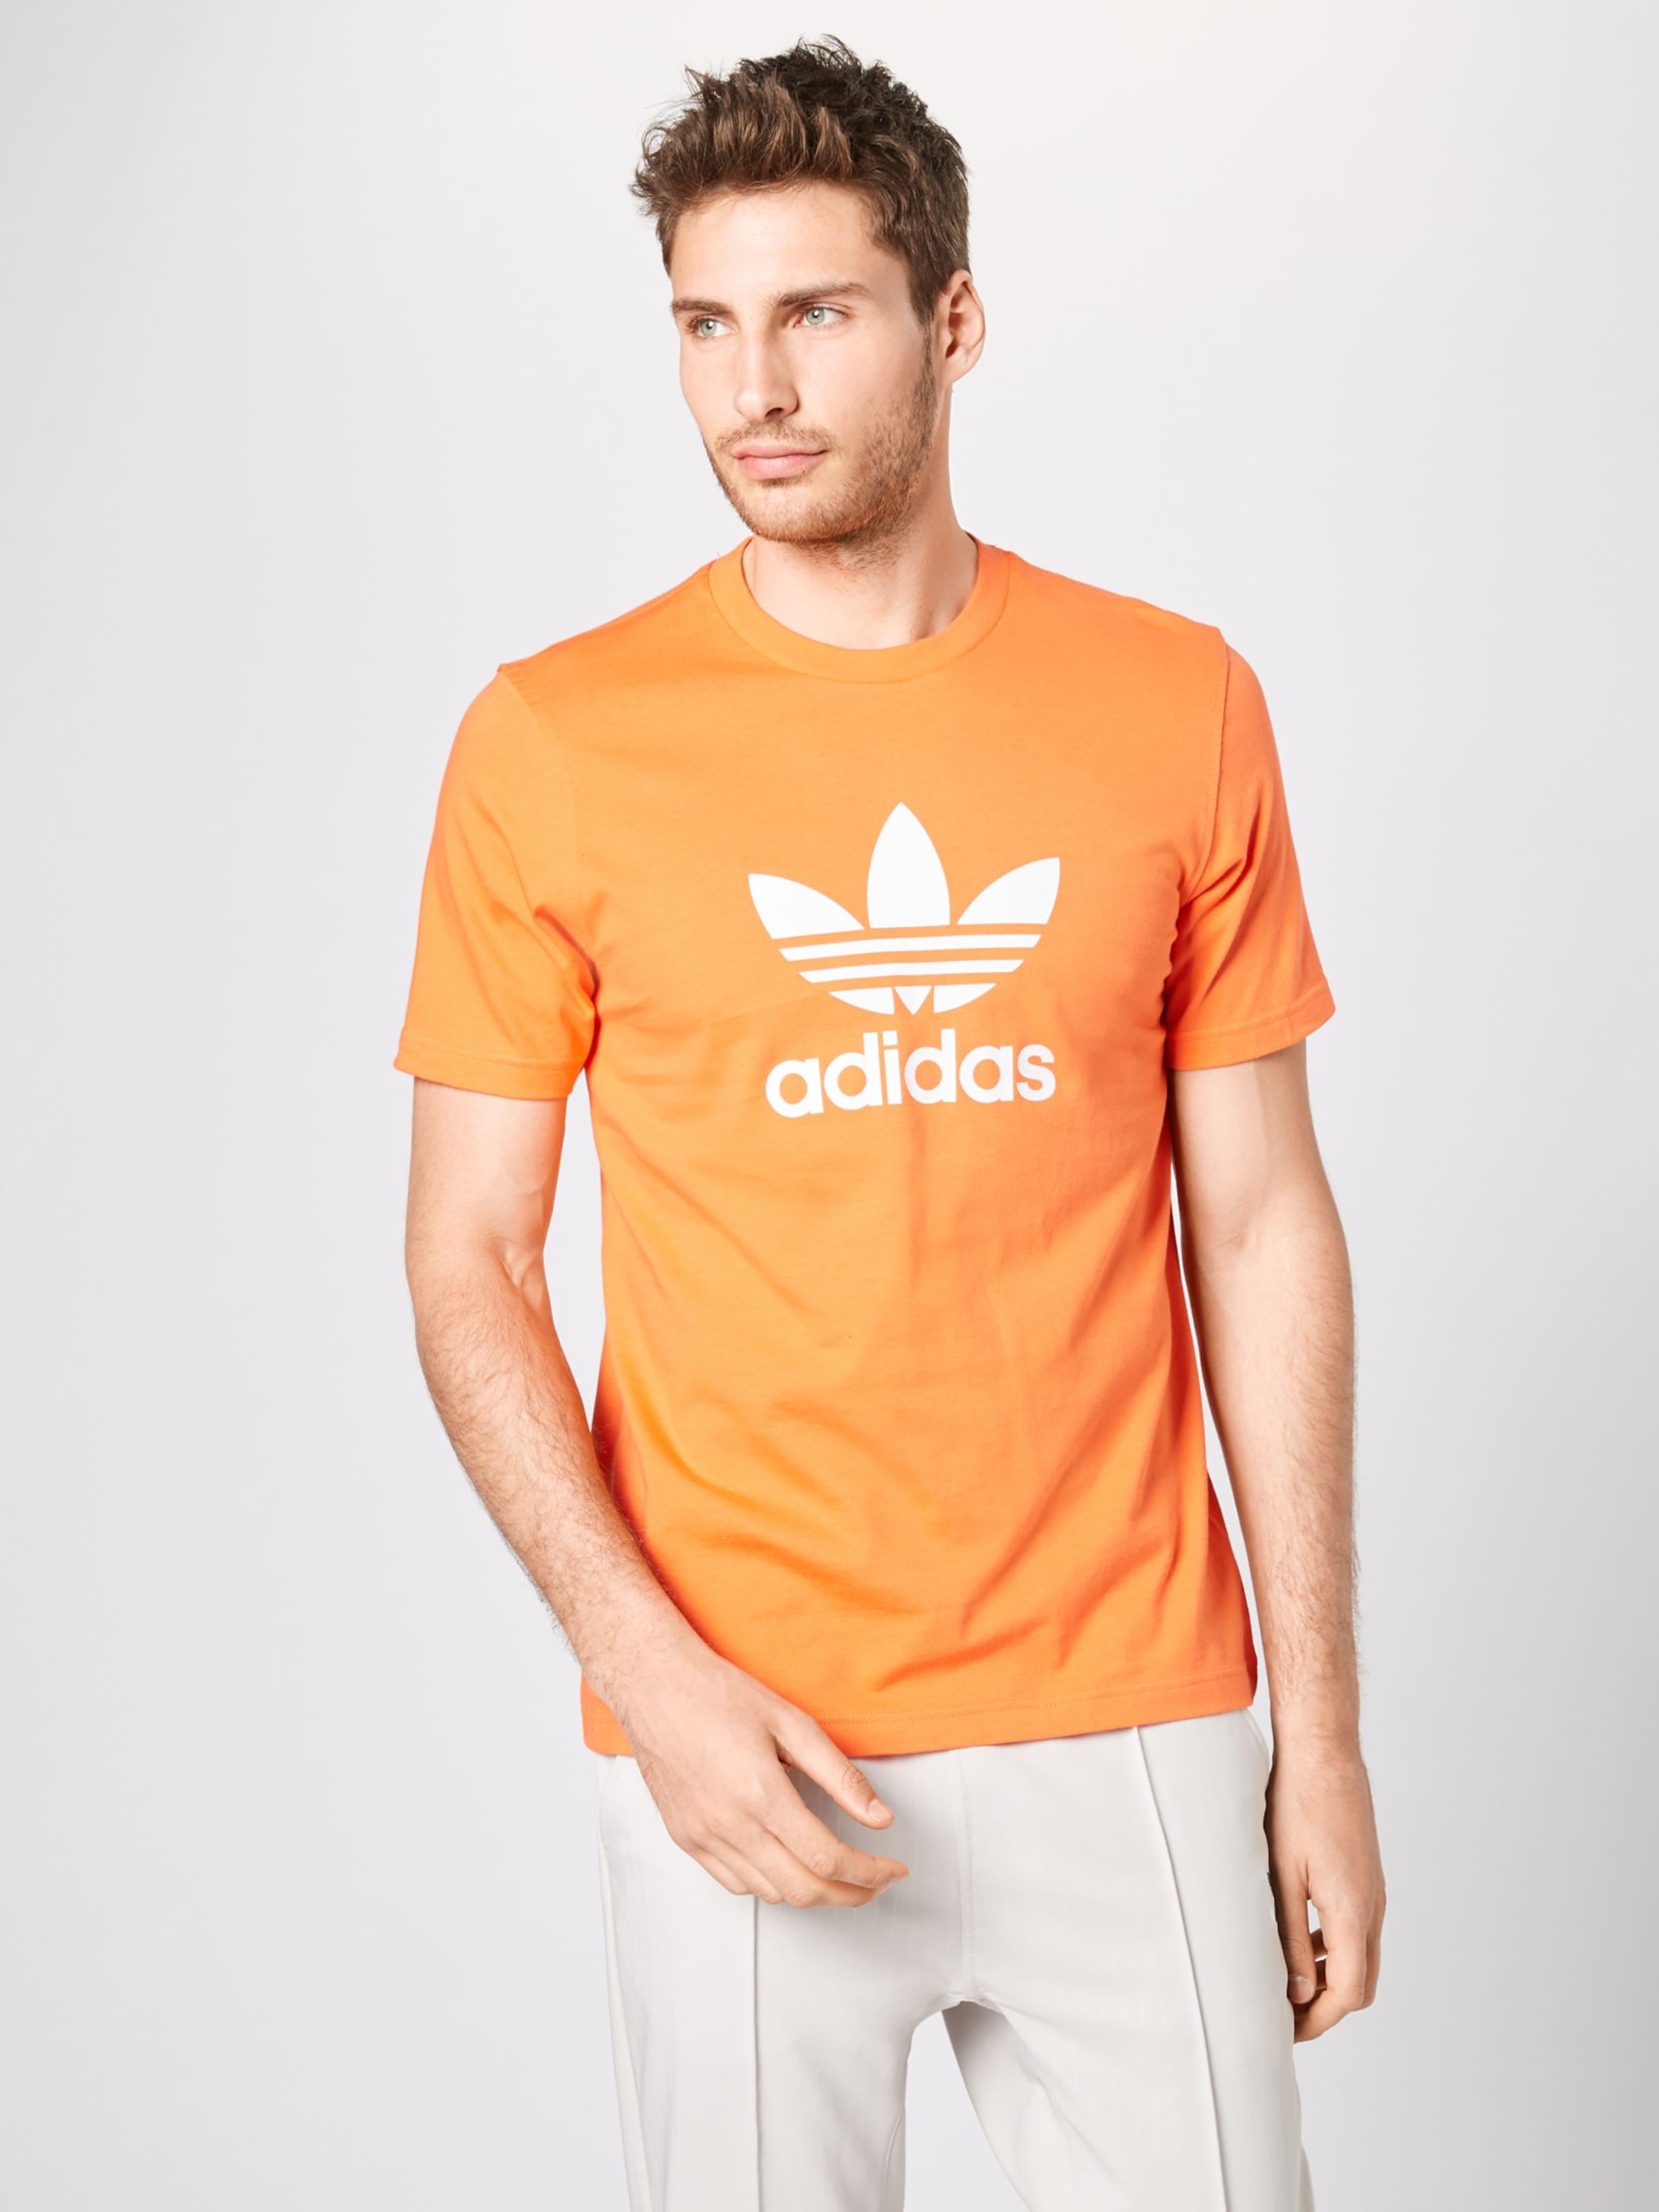 'trefoil' Originals shirt OrangeWeiß In Adidas T Nw8nm0